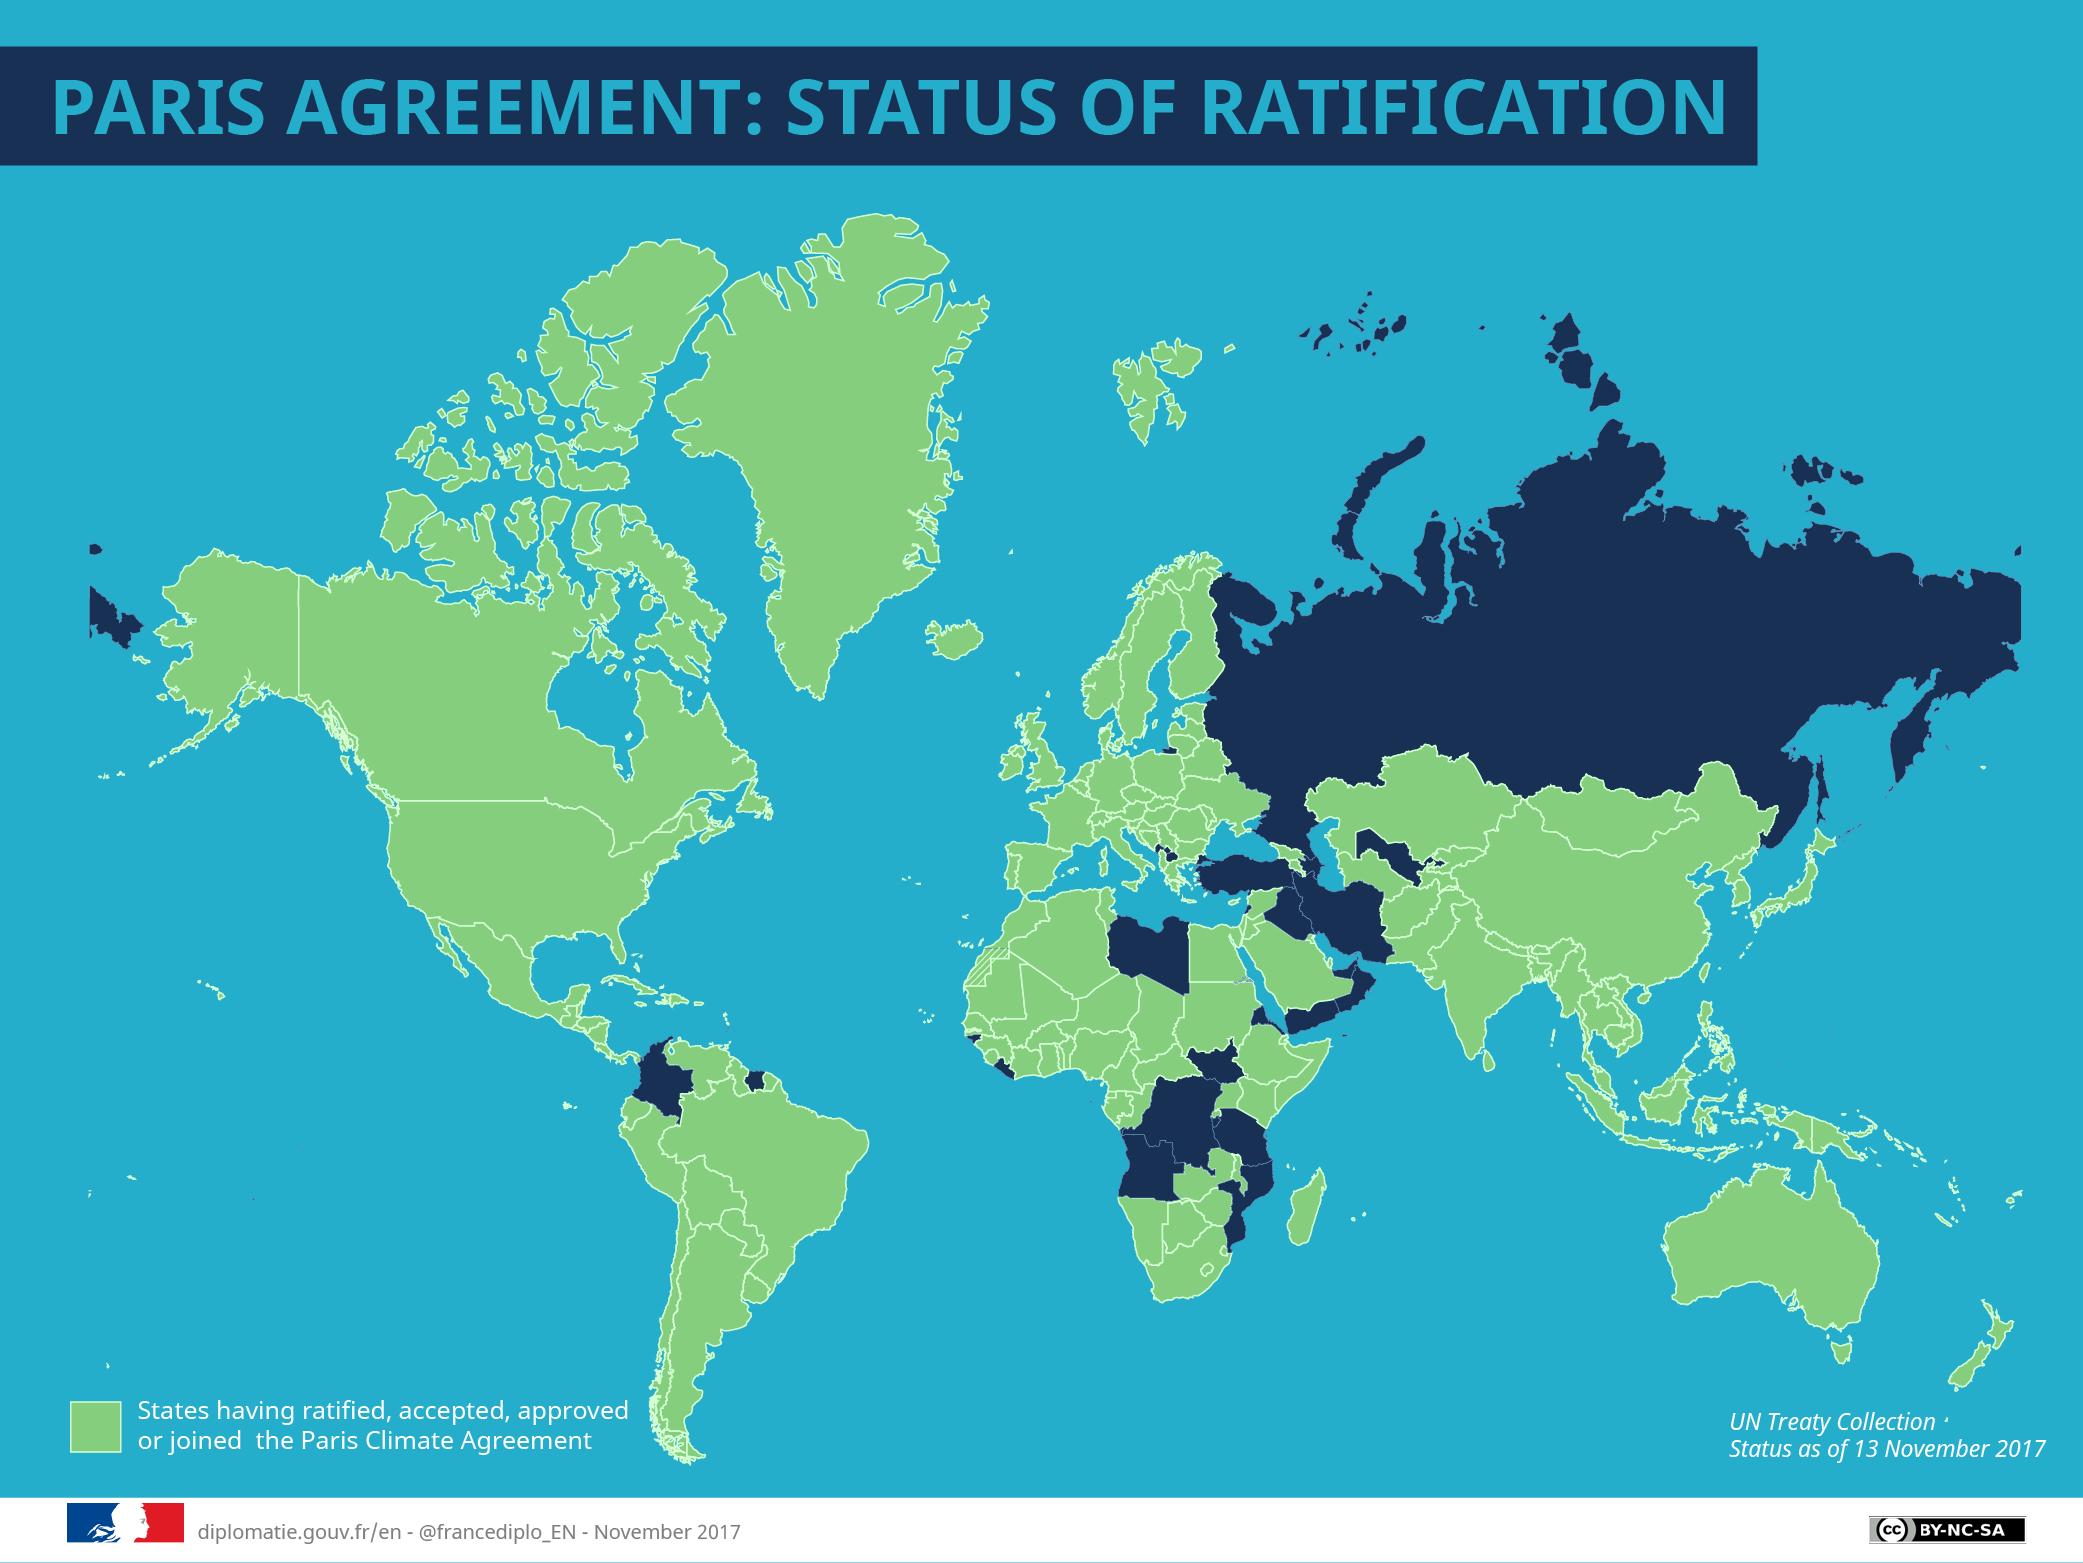 COP21: The key points of the Paris Agreement